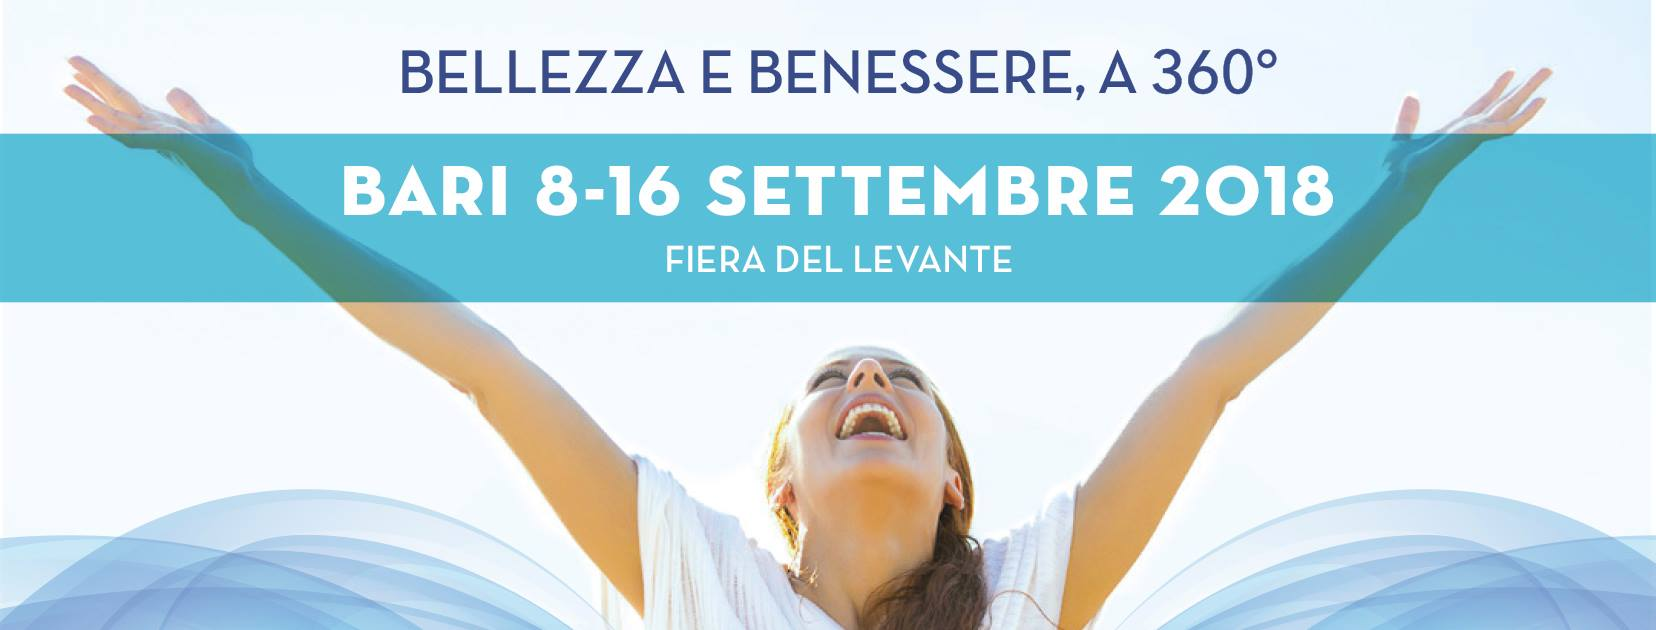 Mediterranean Health & Beauty By Cosmoprof Bologna Ed. 2018. Photo Michele Carnimeo. Copyright Mediterranean Health & Beauty All Rights Reserved